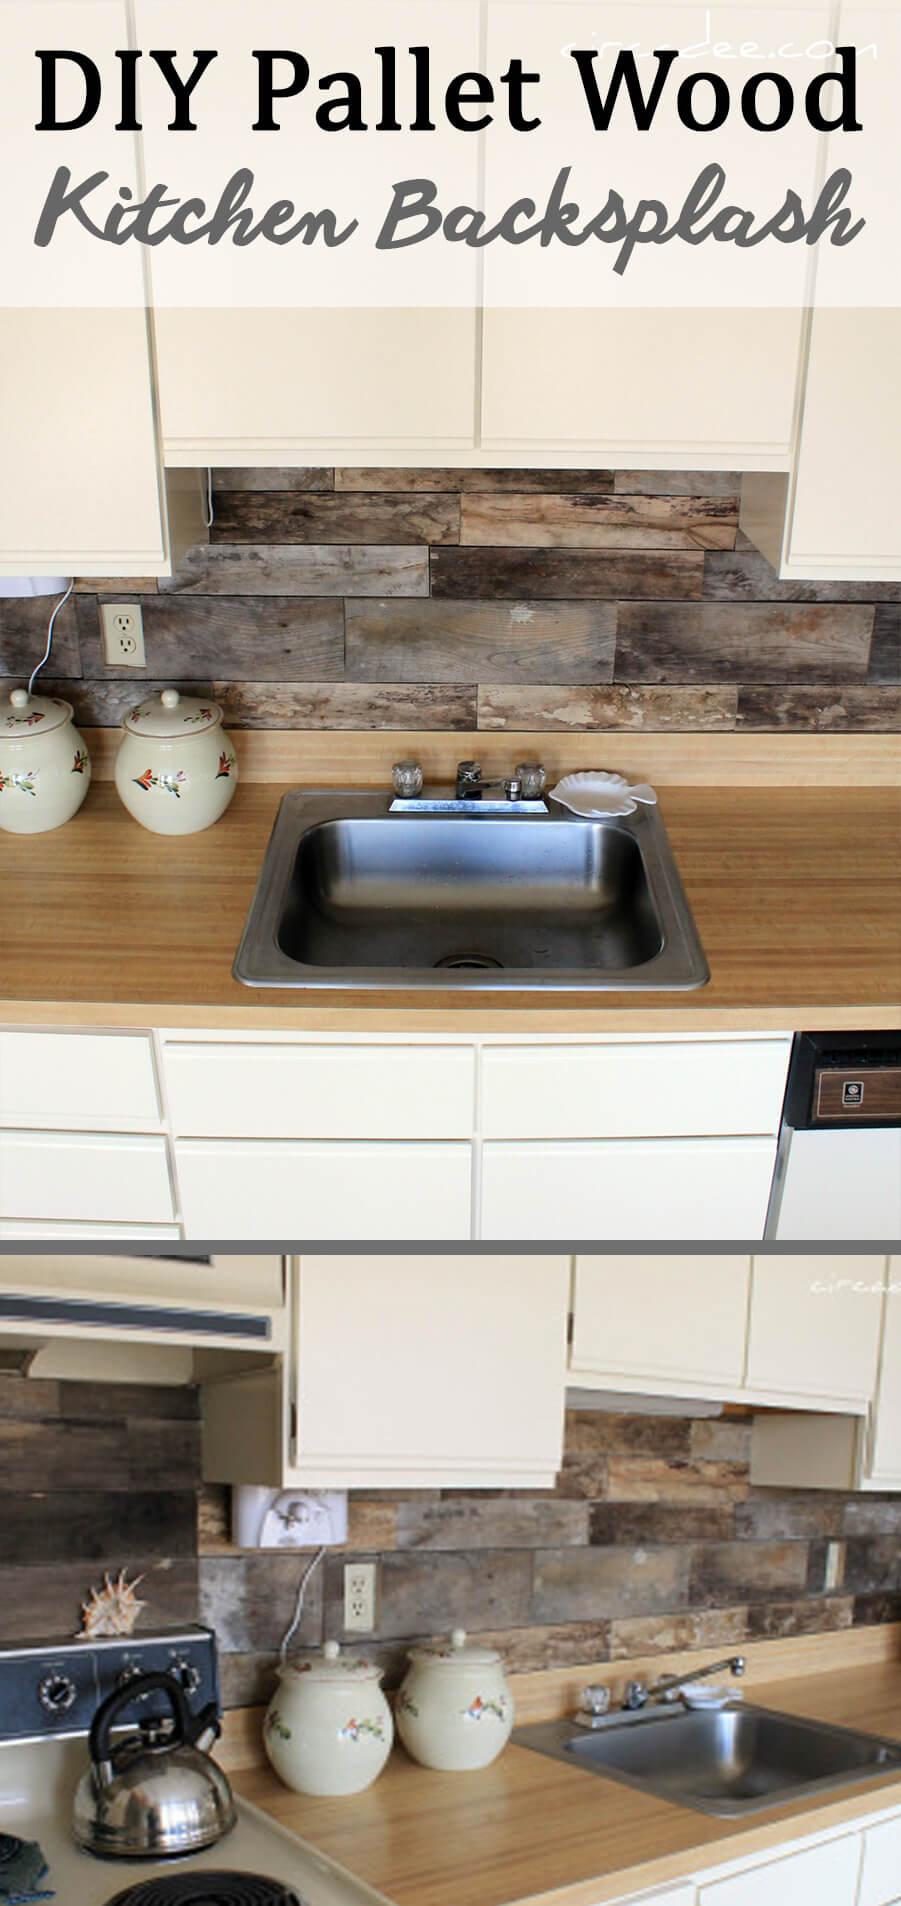 25 Best Diy Kitchen Backsplash Ideas And Designs For 2020